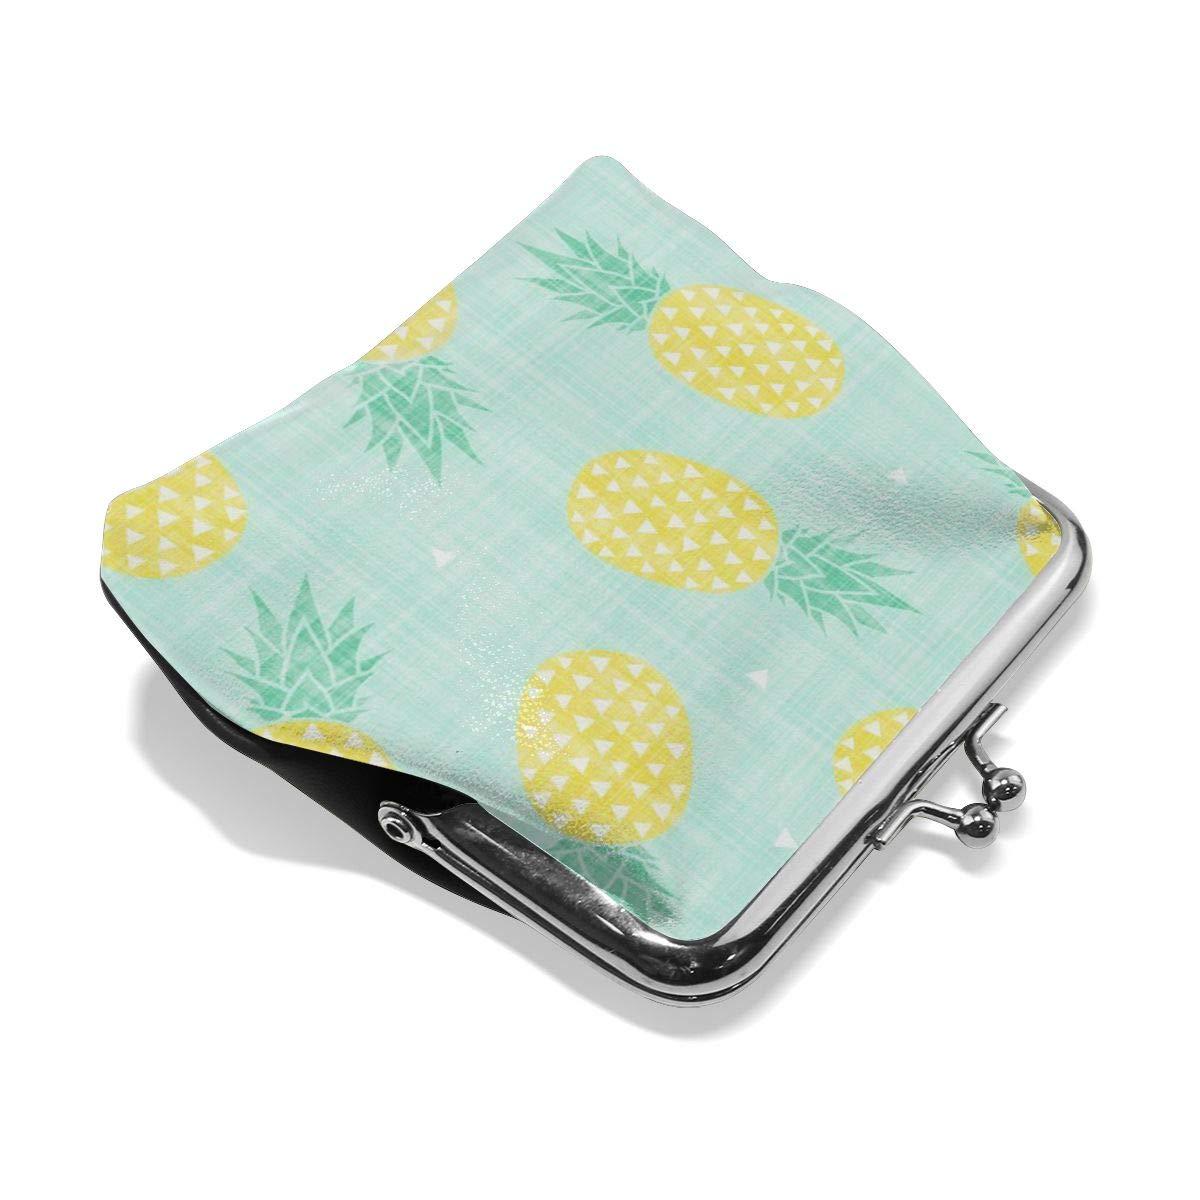 TYDhey Cartoon Pineapple Classic Buckle Coin Purses Leather Kiss-Lock Change Wallets